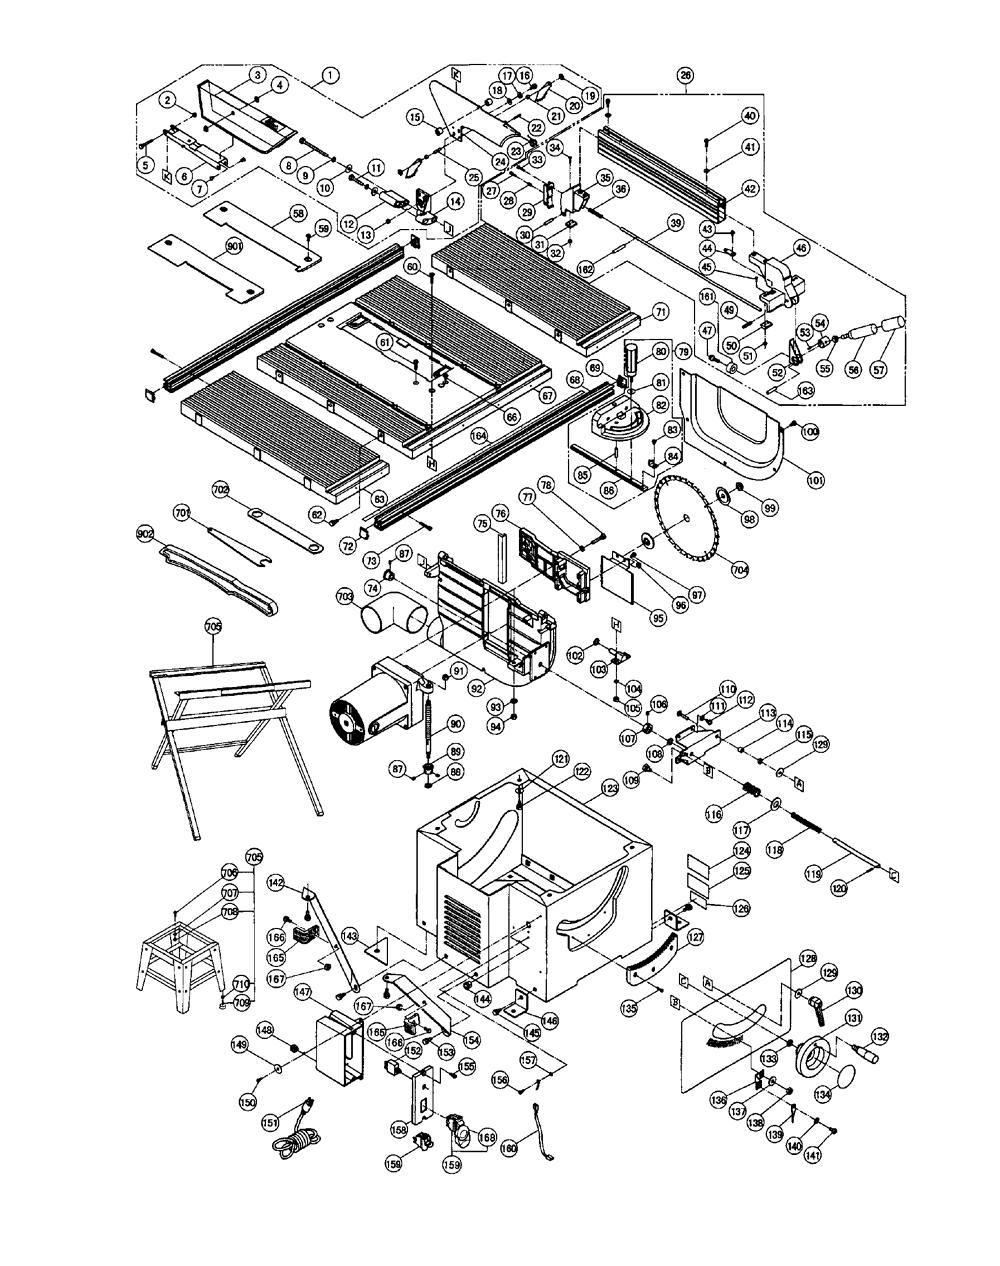 hight resolution of hitachi c10ra2e3 parts schematic